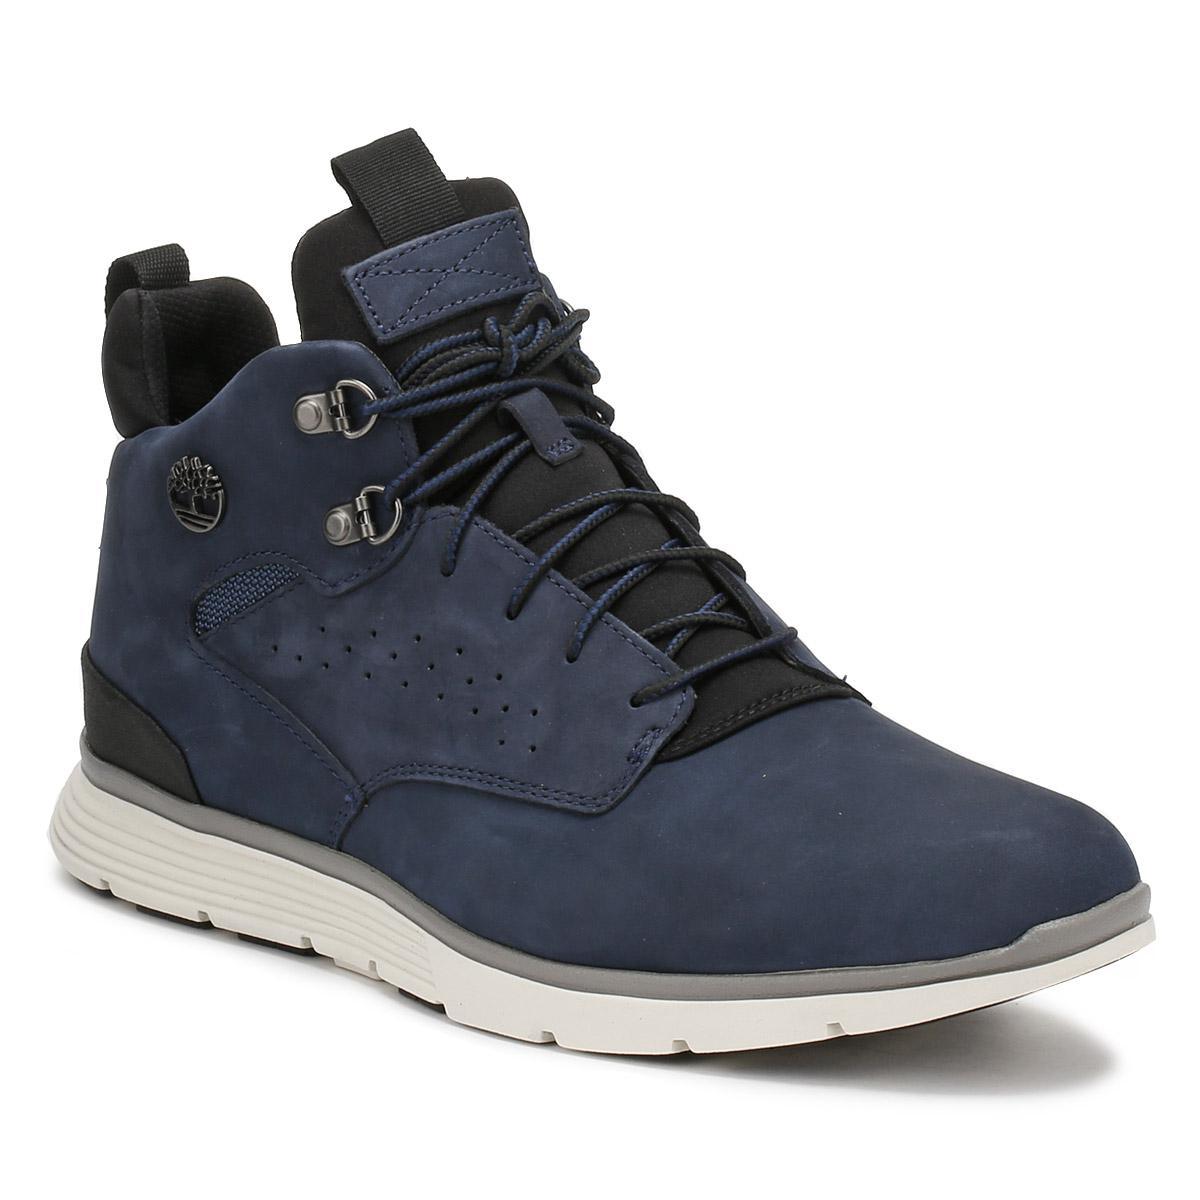 purchase original exclusive shoes most reliable Mens Navy Killington Hiker Chukka Boots